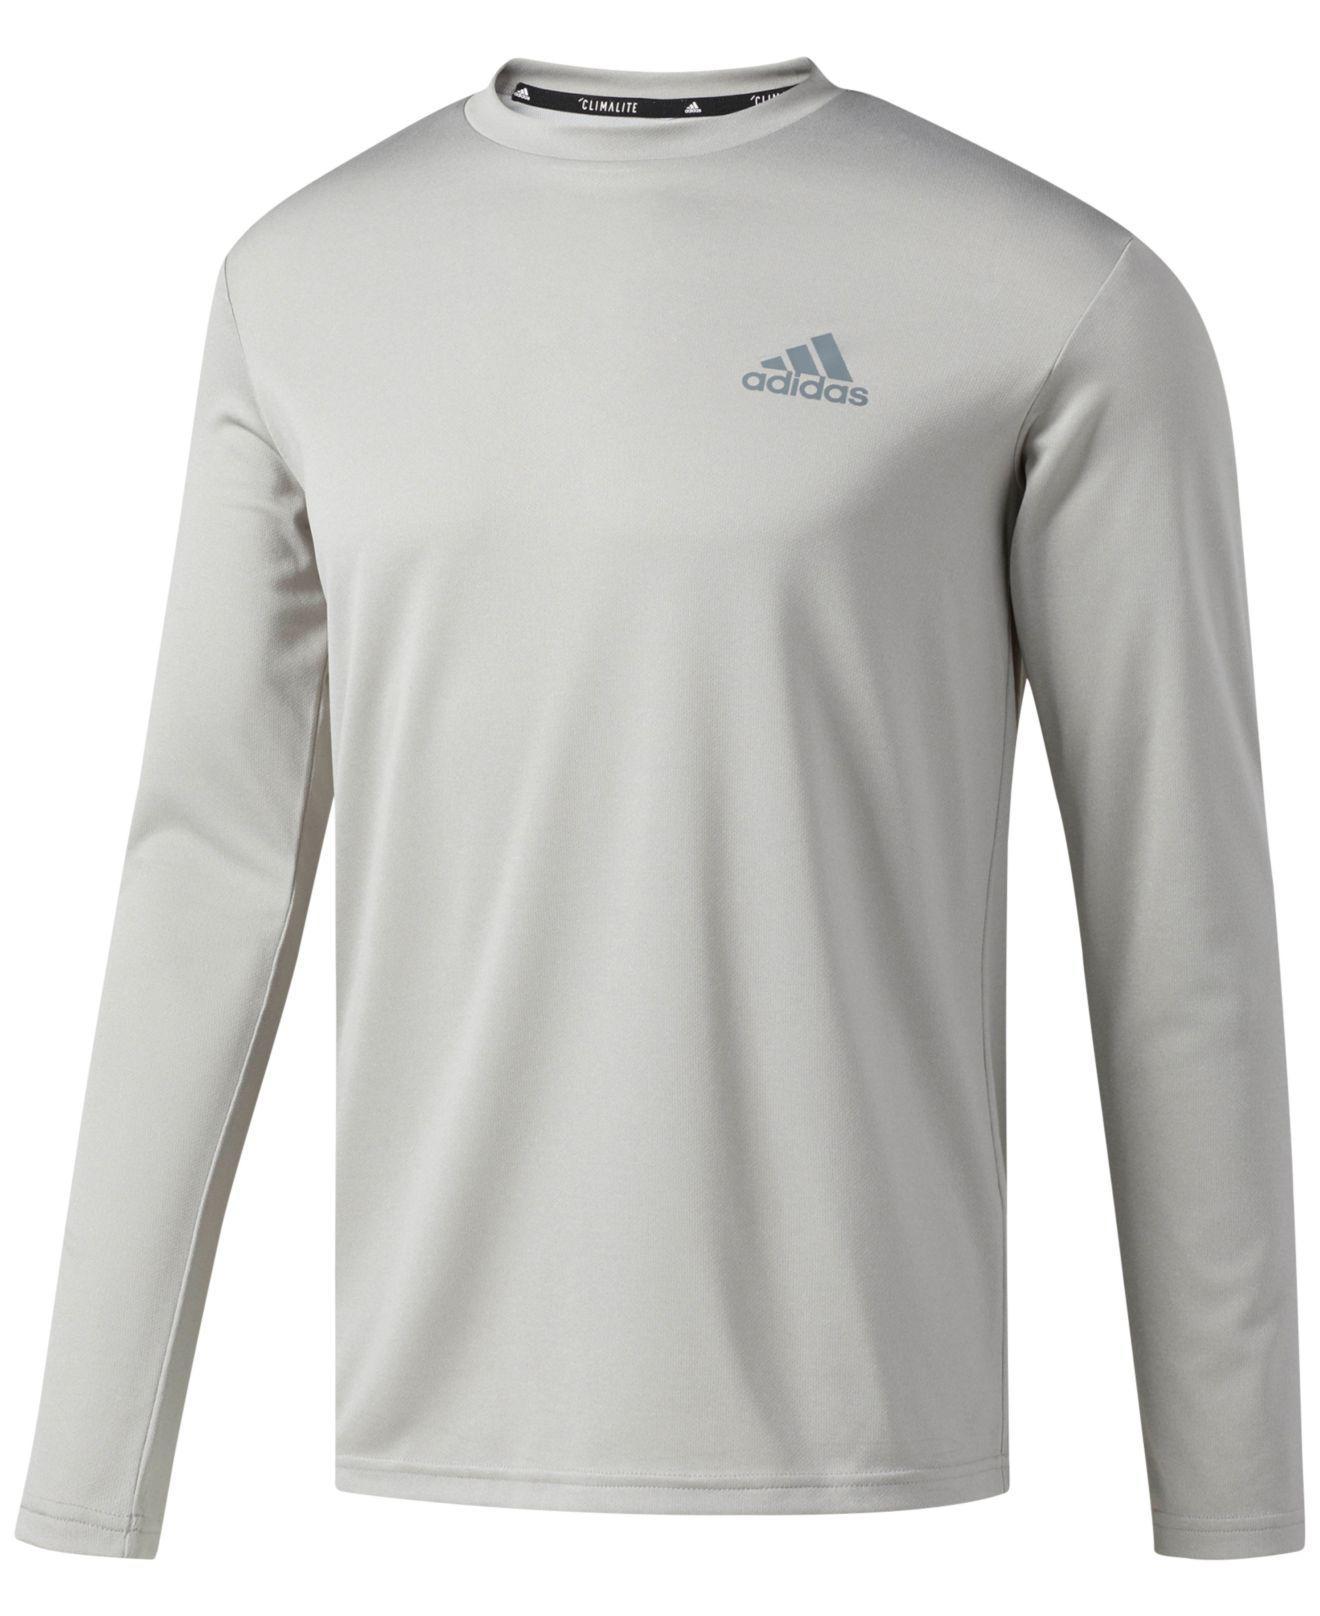 7fe06c56 adidas Men's Climalite® Slim Long-sleeve T-shirt in Gray for Men - Lyst